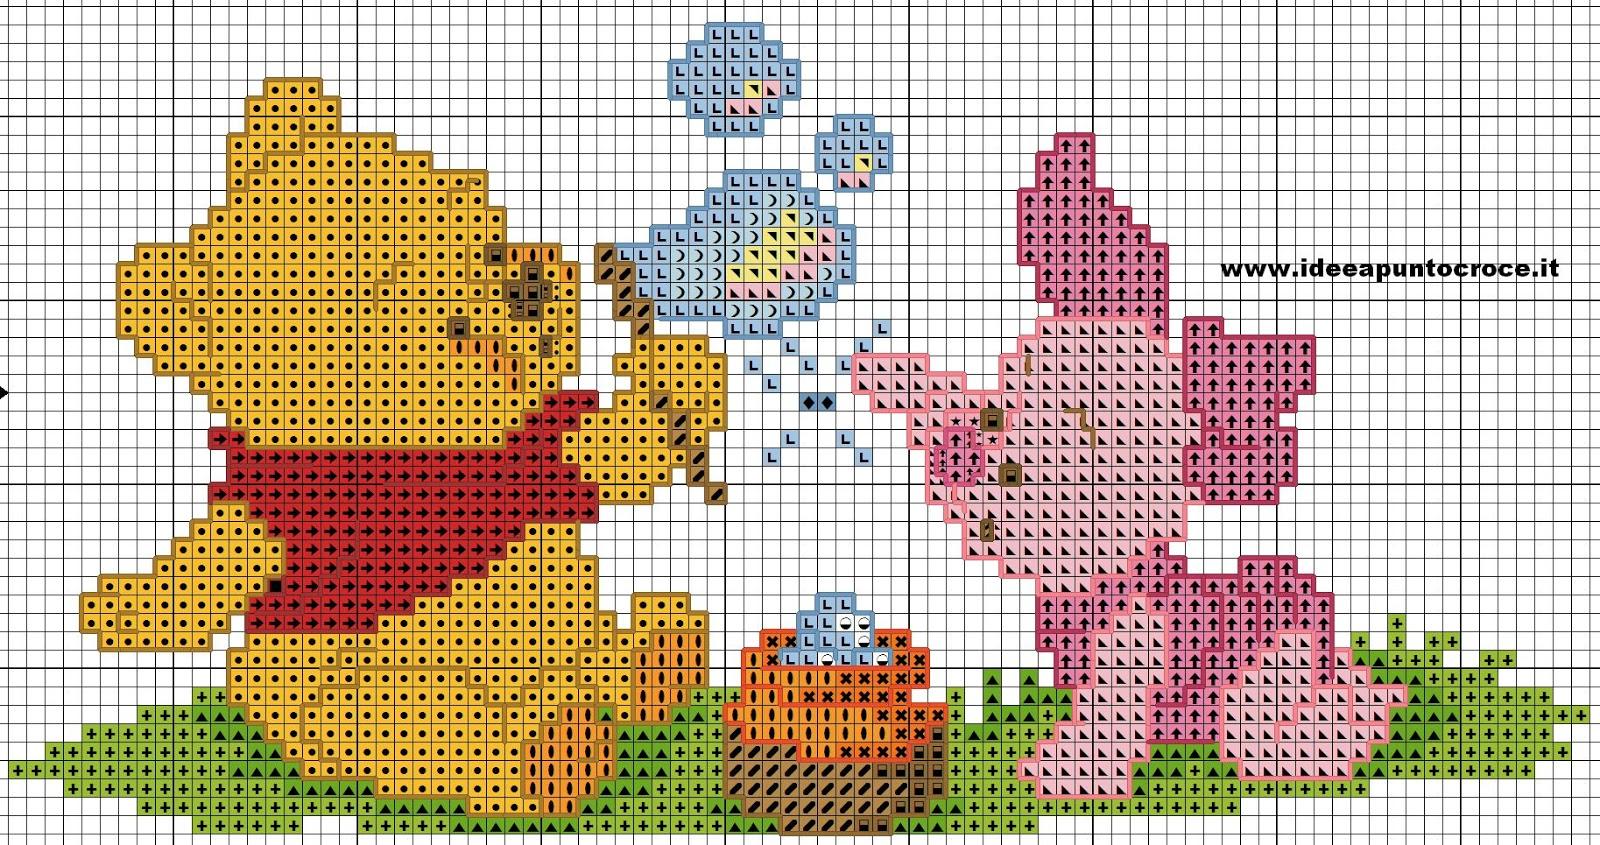 Schemi disney a punto croce schemi baby winnie the pooh for Winnie the pooh punto croce schemi